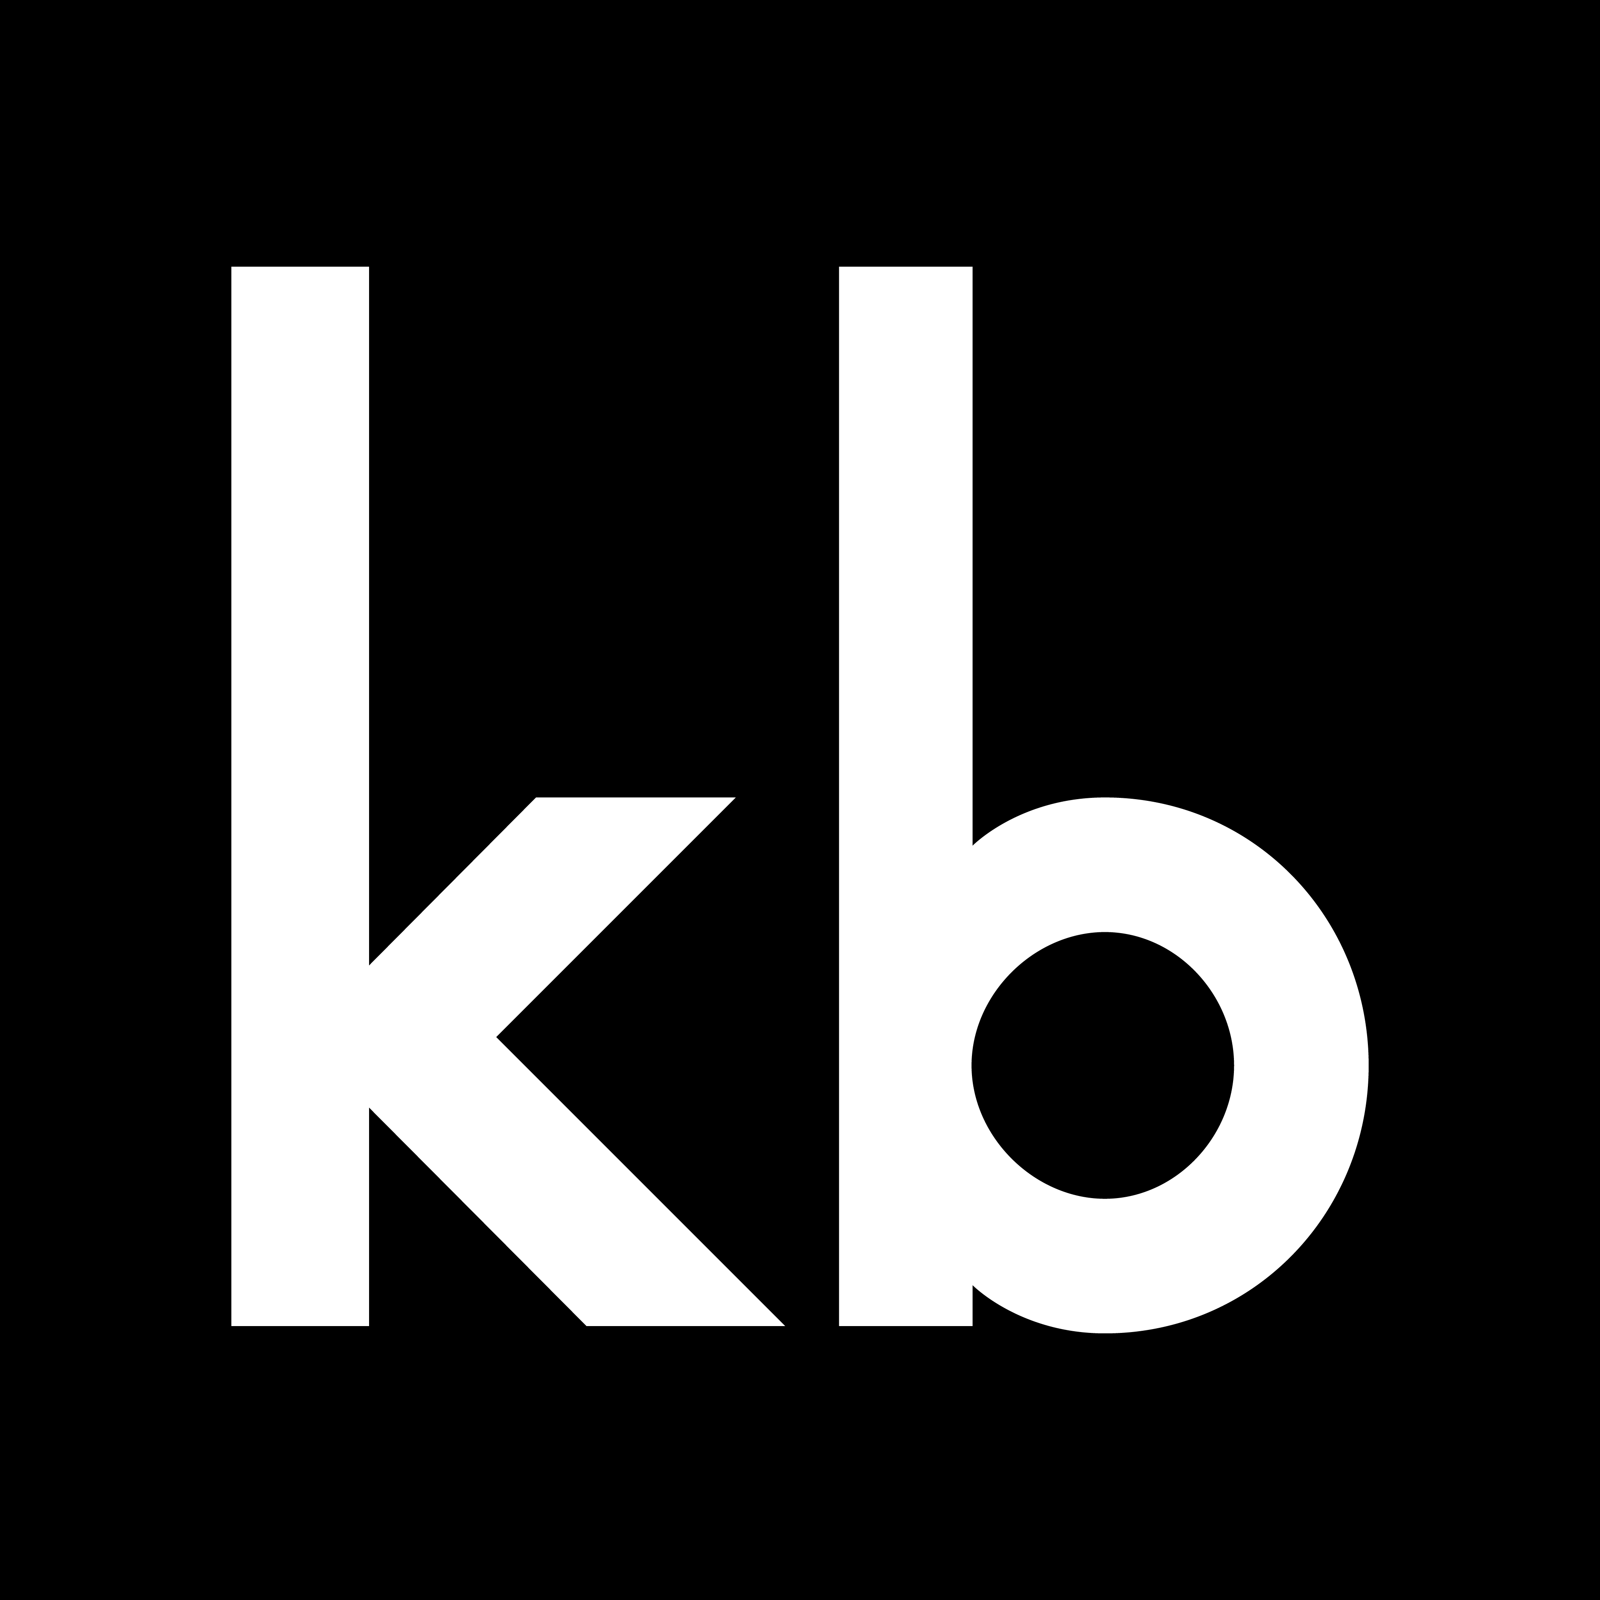 KATE BANAZI